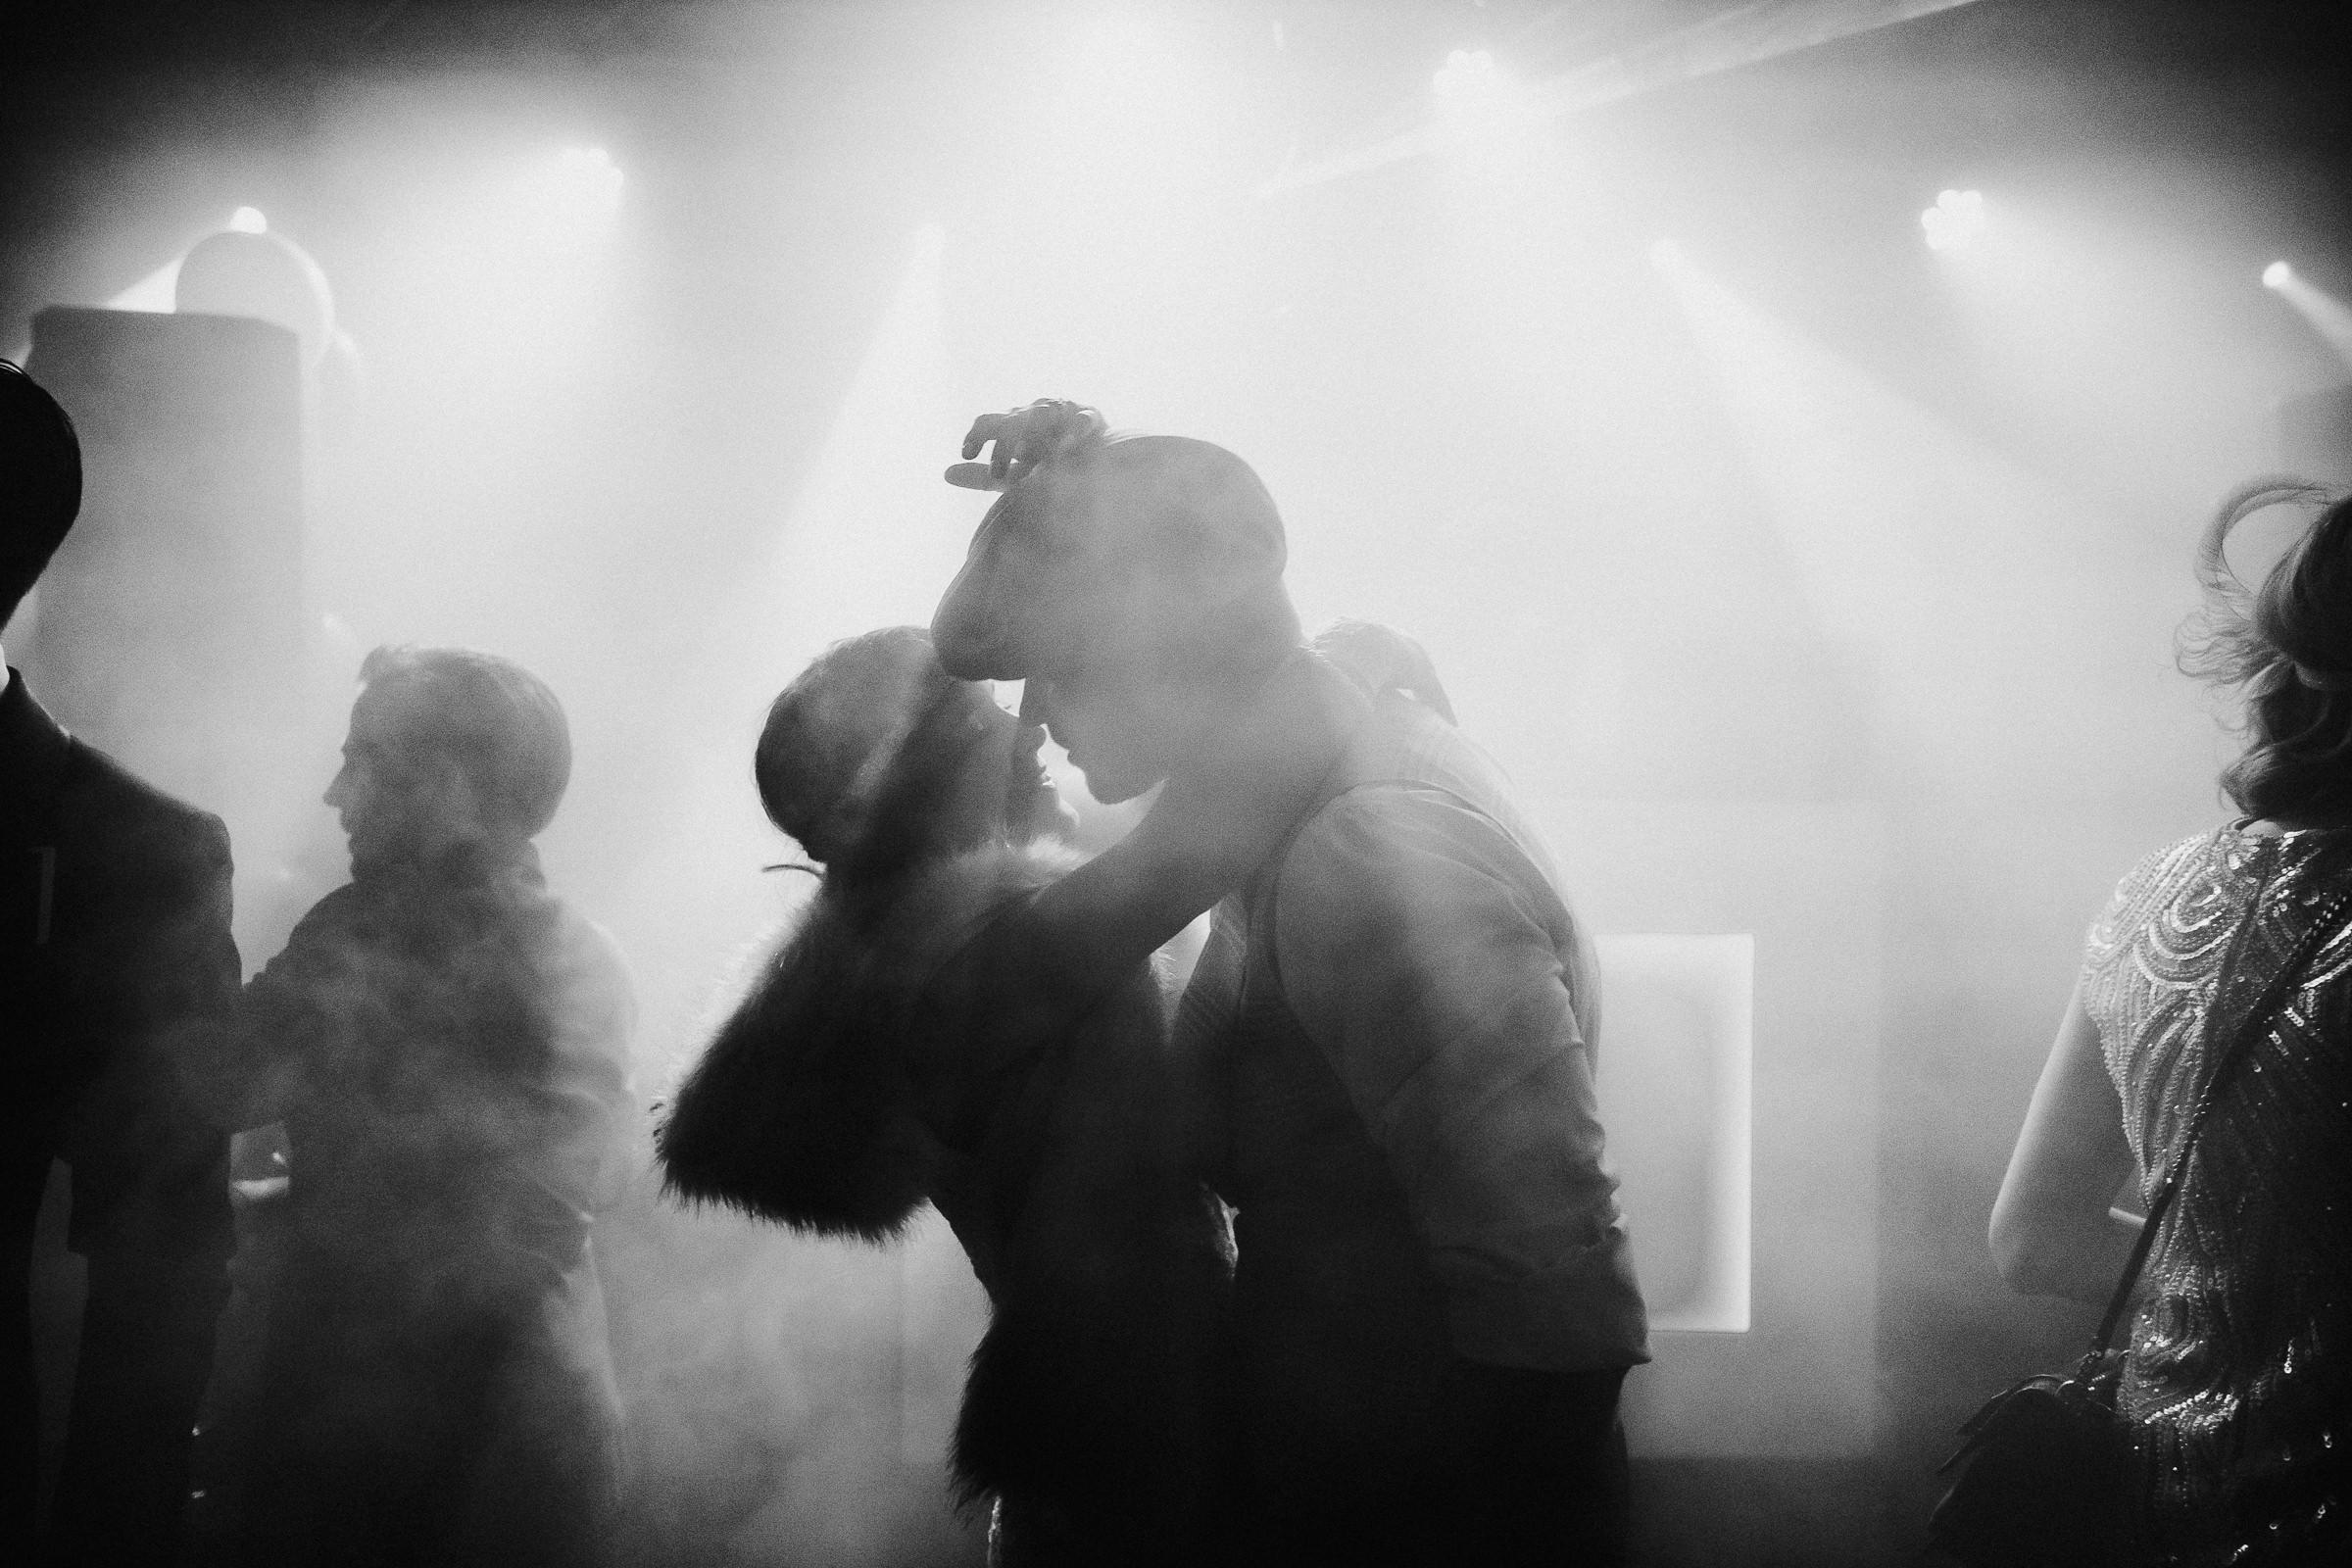 First dance in smoky room - photo by Naomi van der Kraan